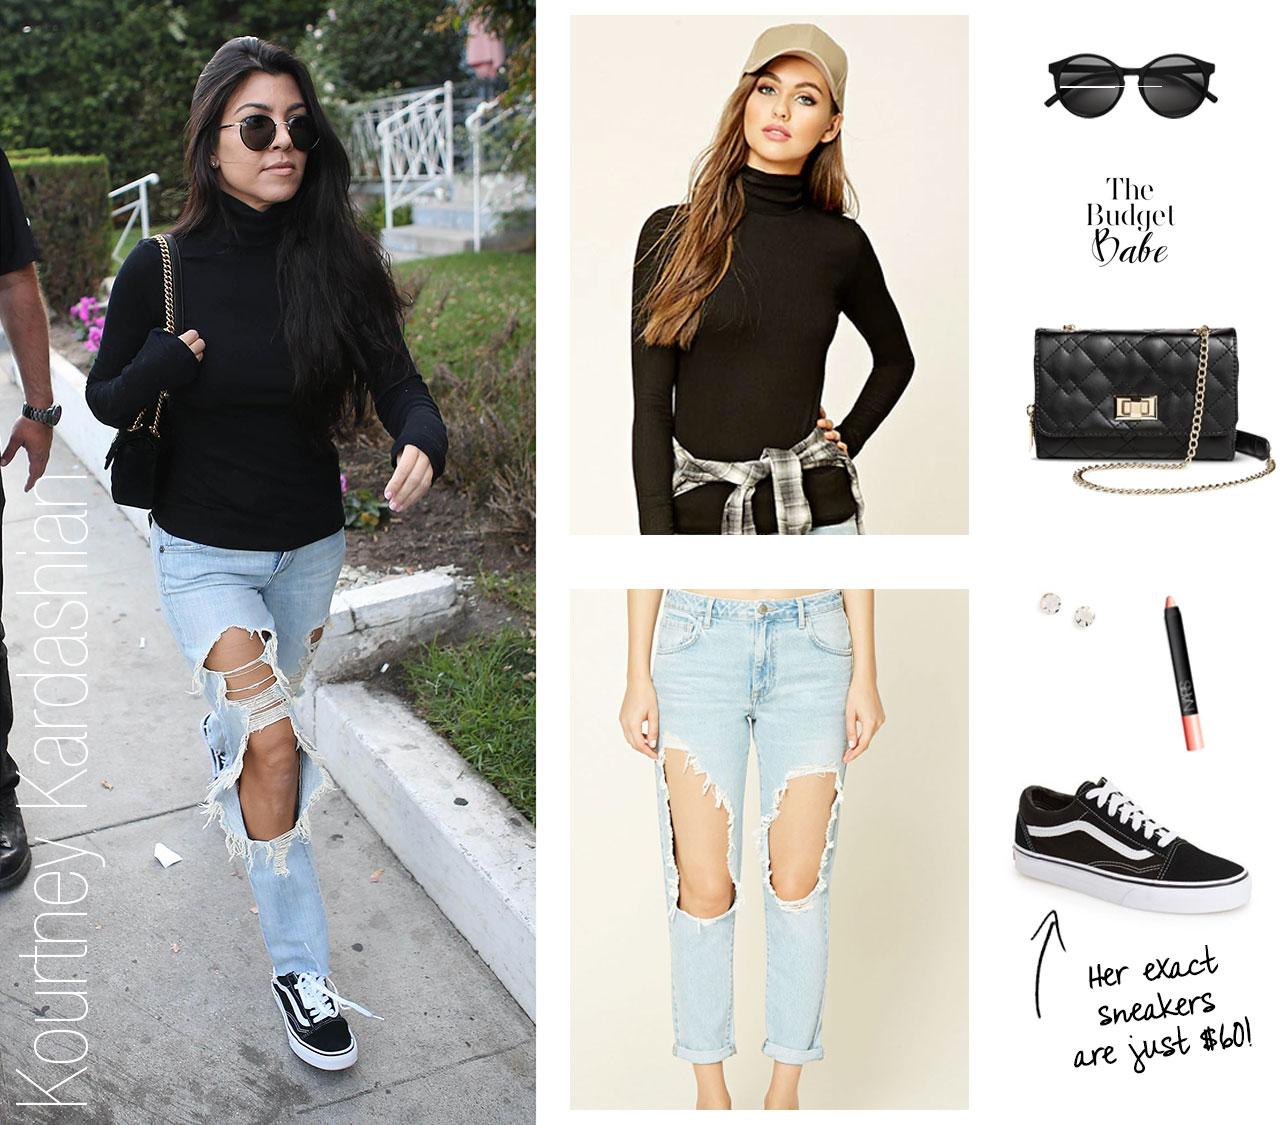 4824b15933fa Shop Kourtney Kardashian s turtleneck top and destroyed jeans look for less.